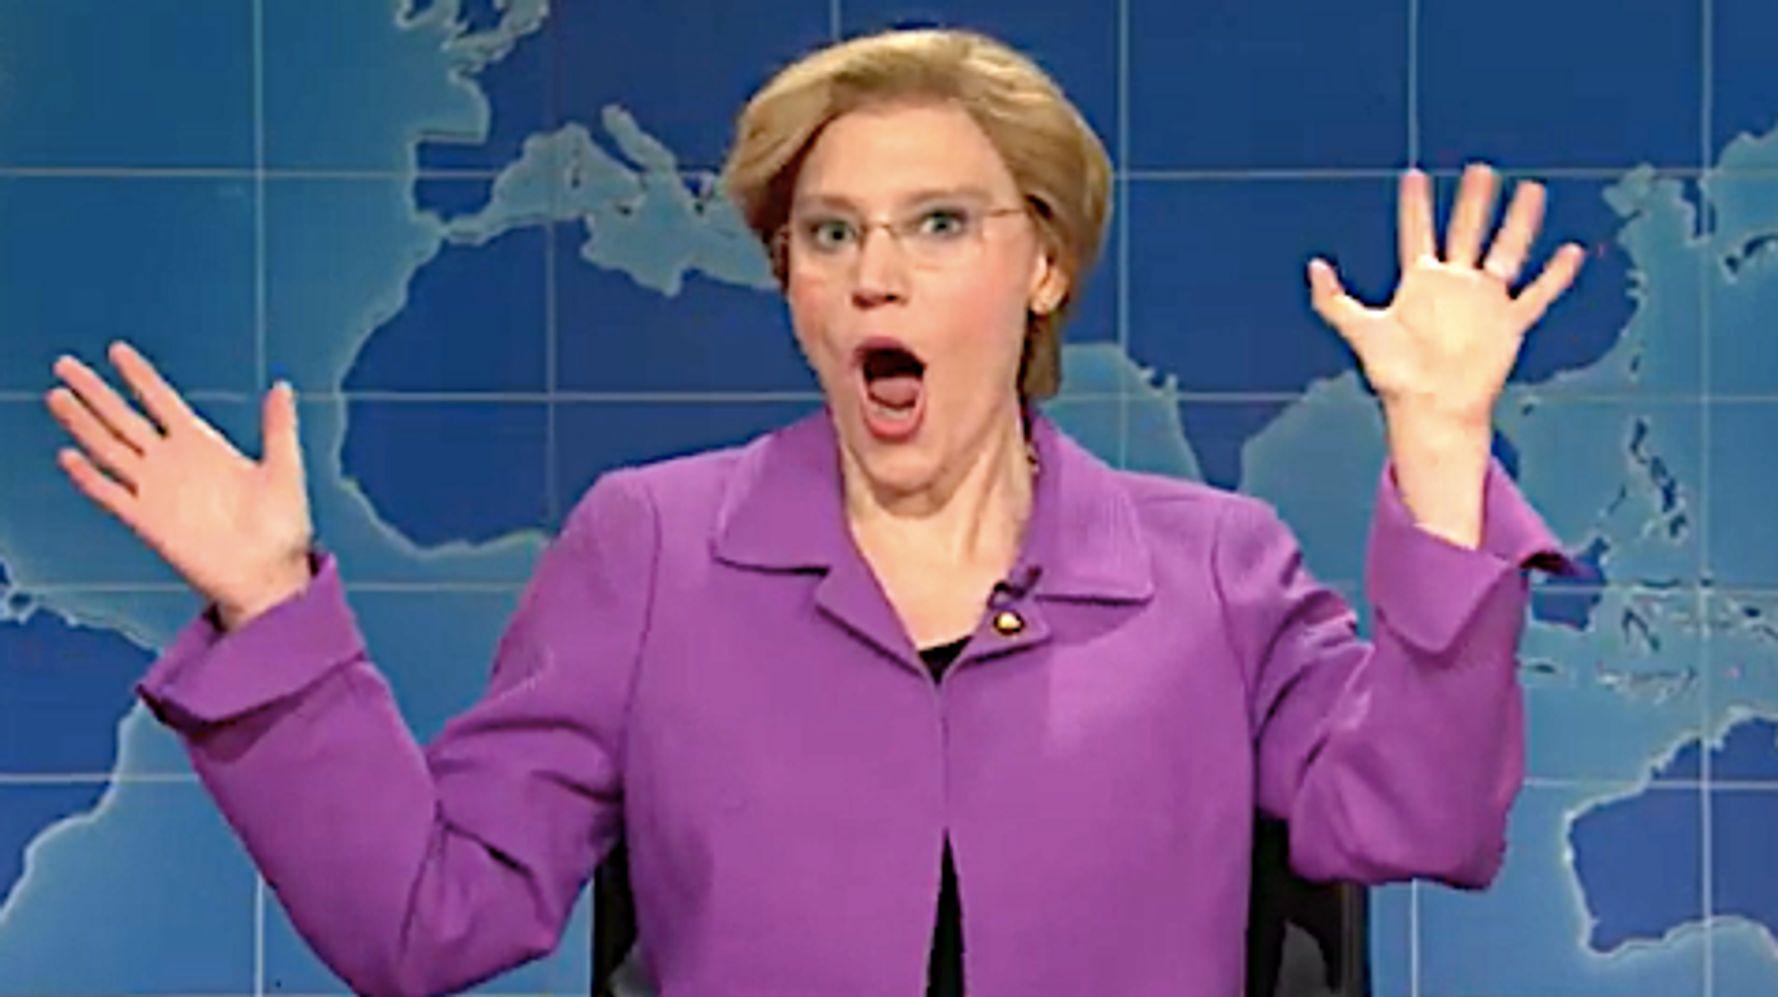 Westlake Legal Group 5d998999210000b103aa755f Kate McKinnon's Elizabeth Warren Fakes Horror That Billionaires Don't Like Her On 'SNL'